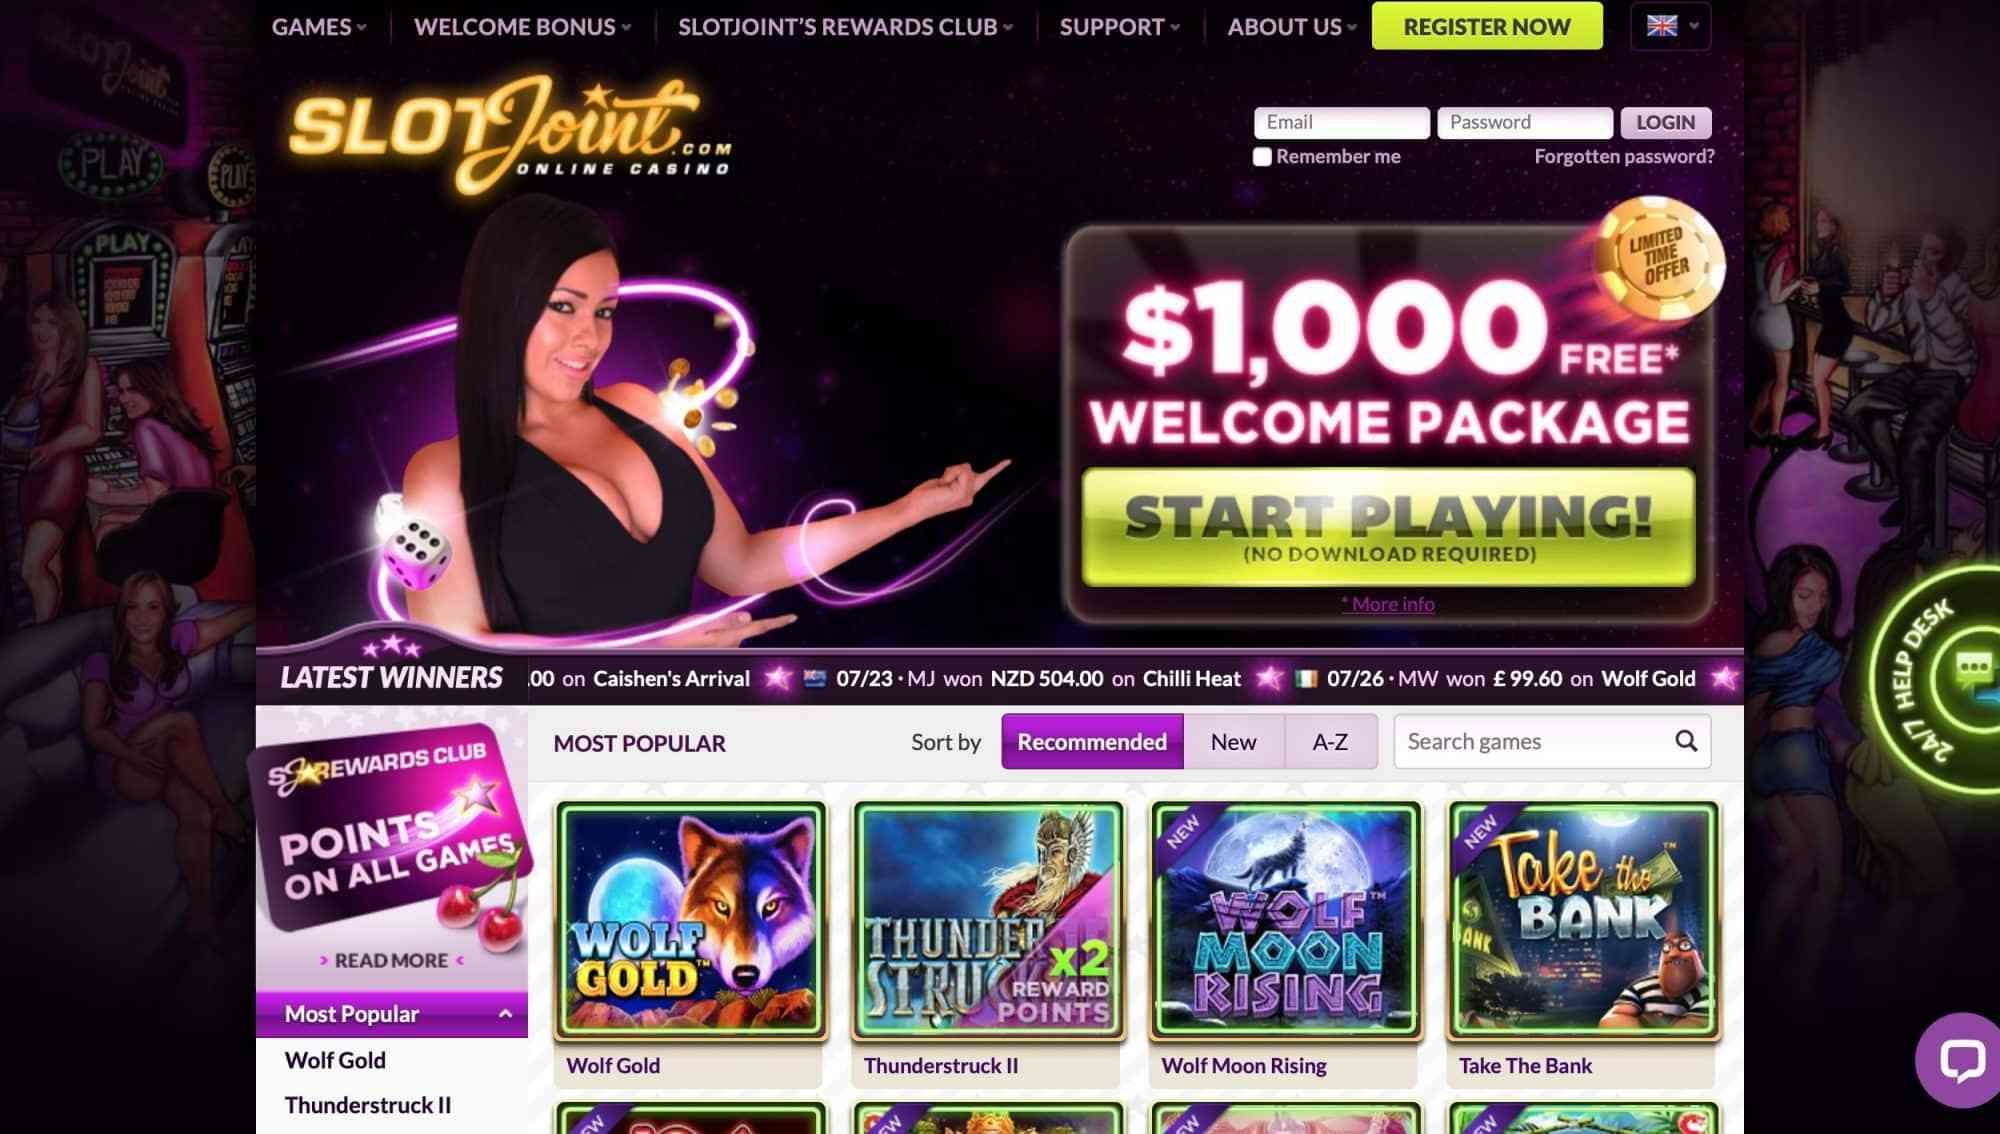 SlotJoint - free spins and 1000 bonus for 5 deposits